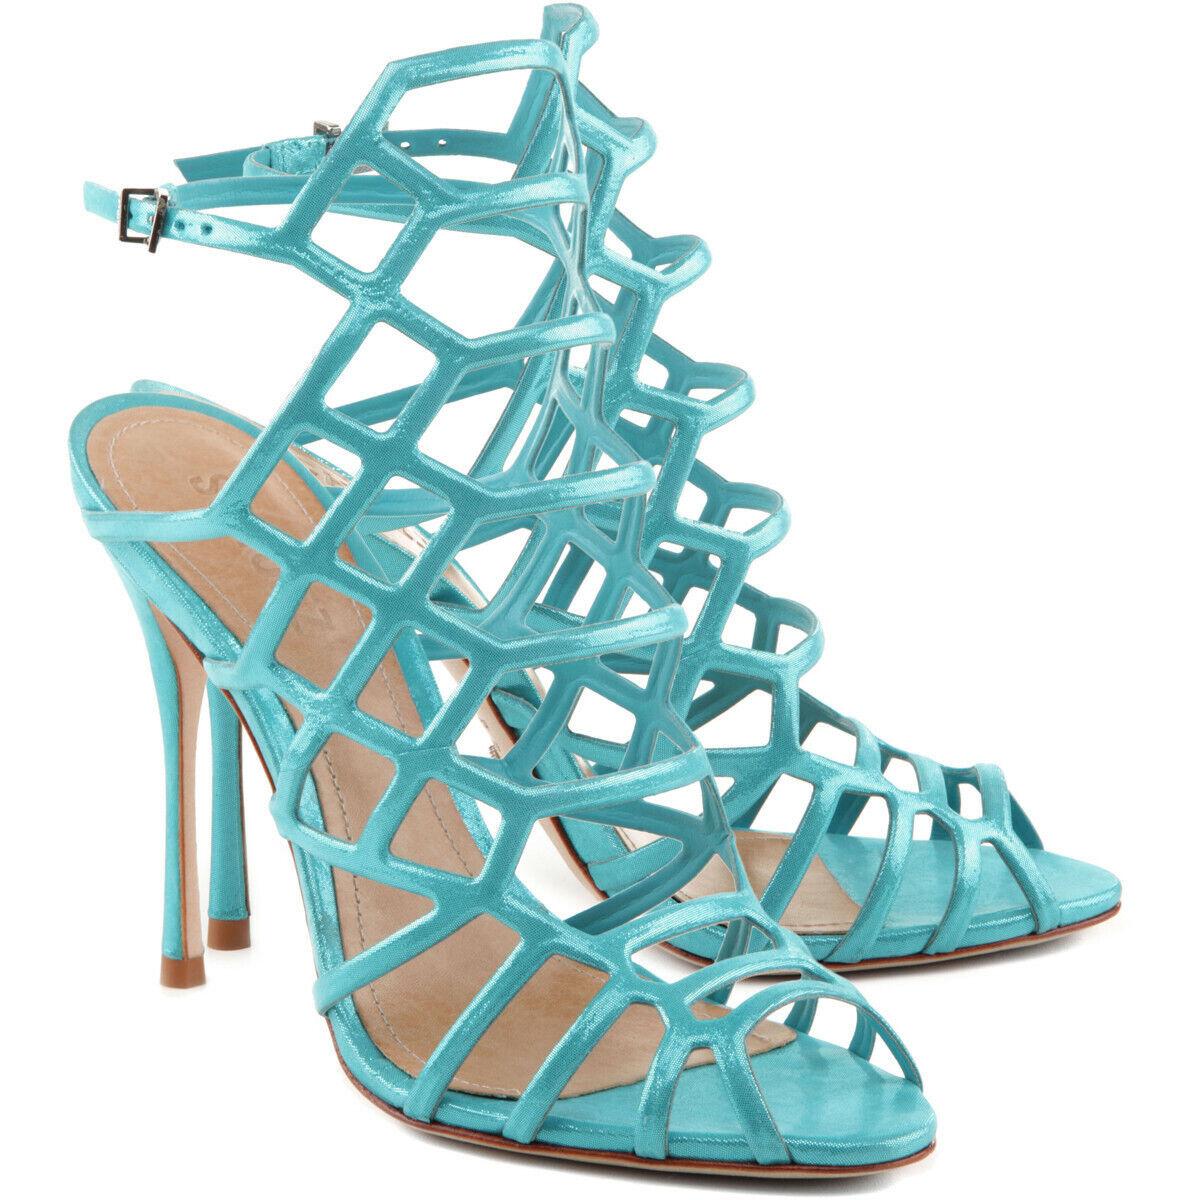 Schutz Juliana Dark Aqua blå Caged Single Sole HIgh Stiletto Heel Dress Sandal